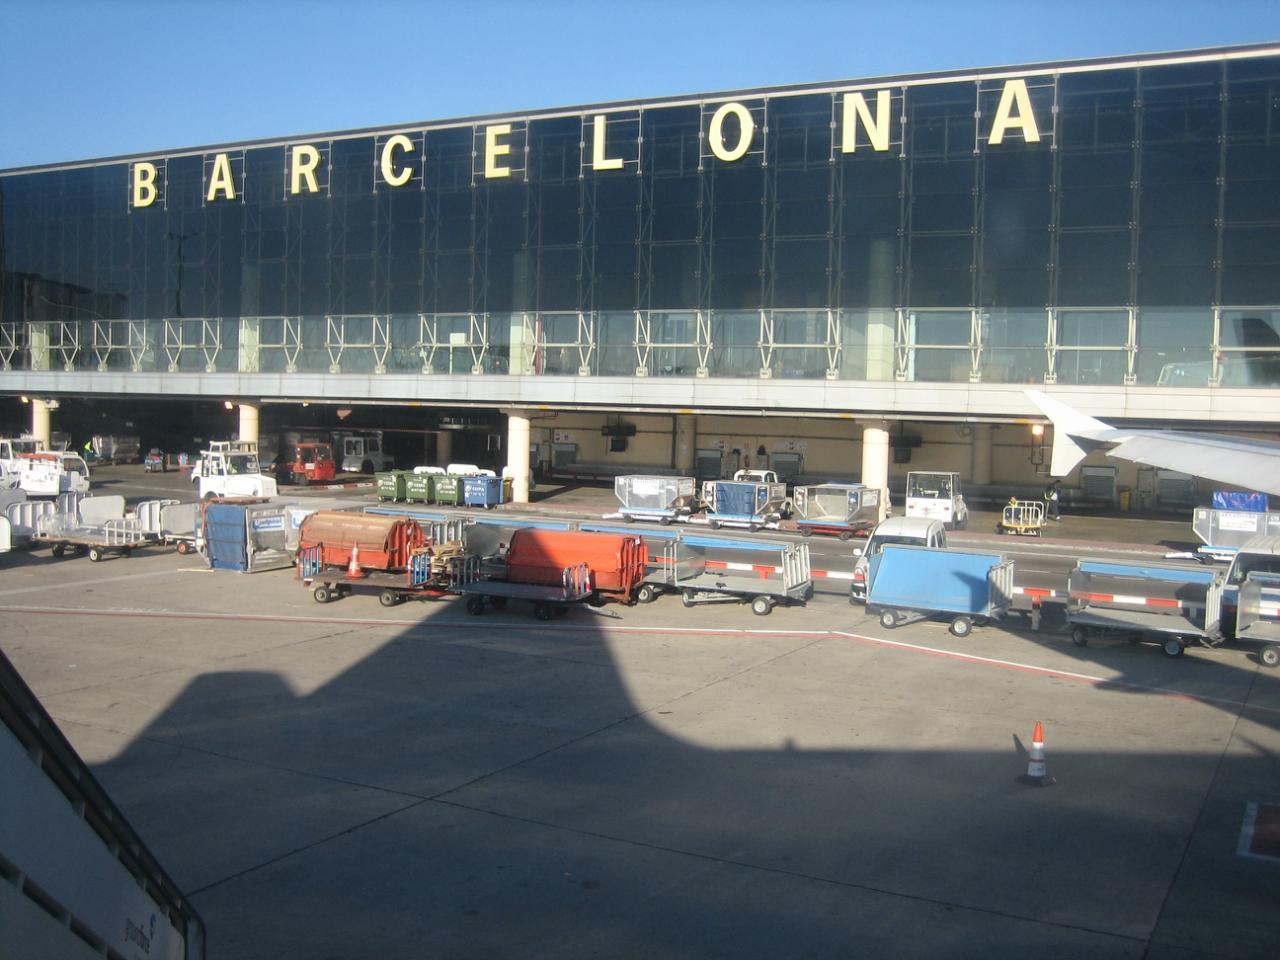 Aeropuerto De Barcelona El Prat Bcn Aeropuertos Net